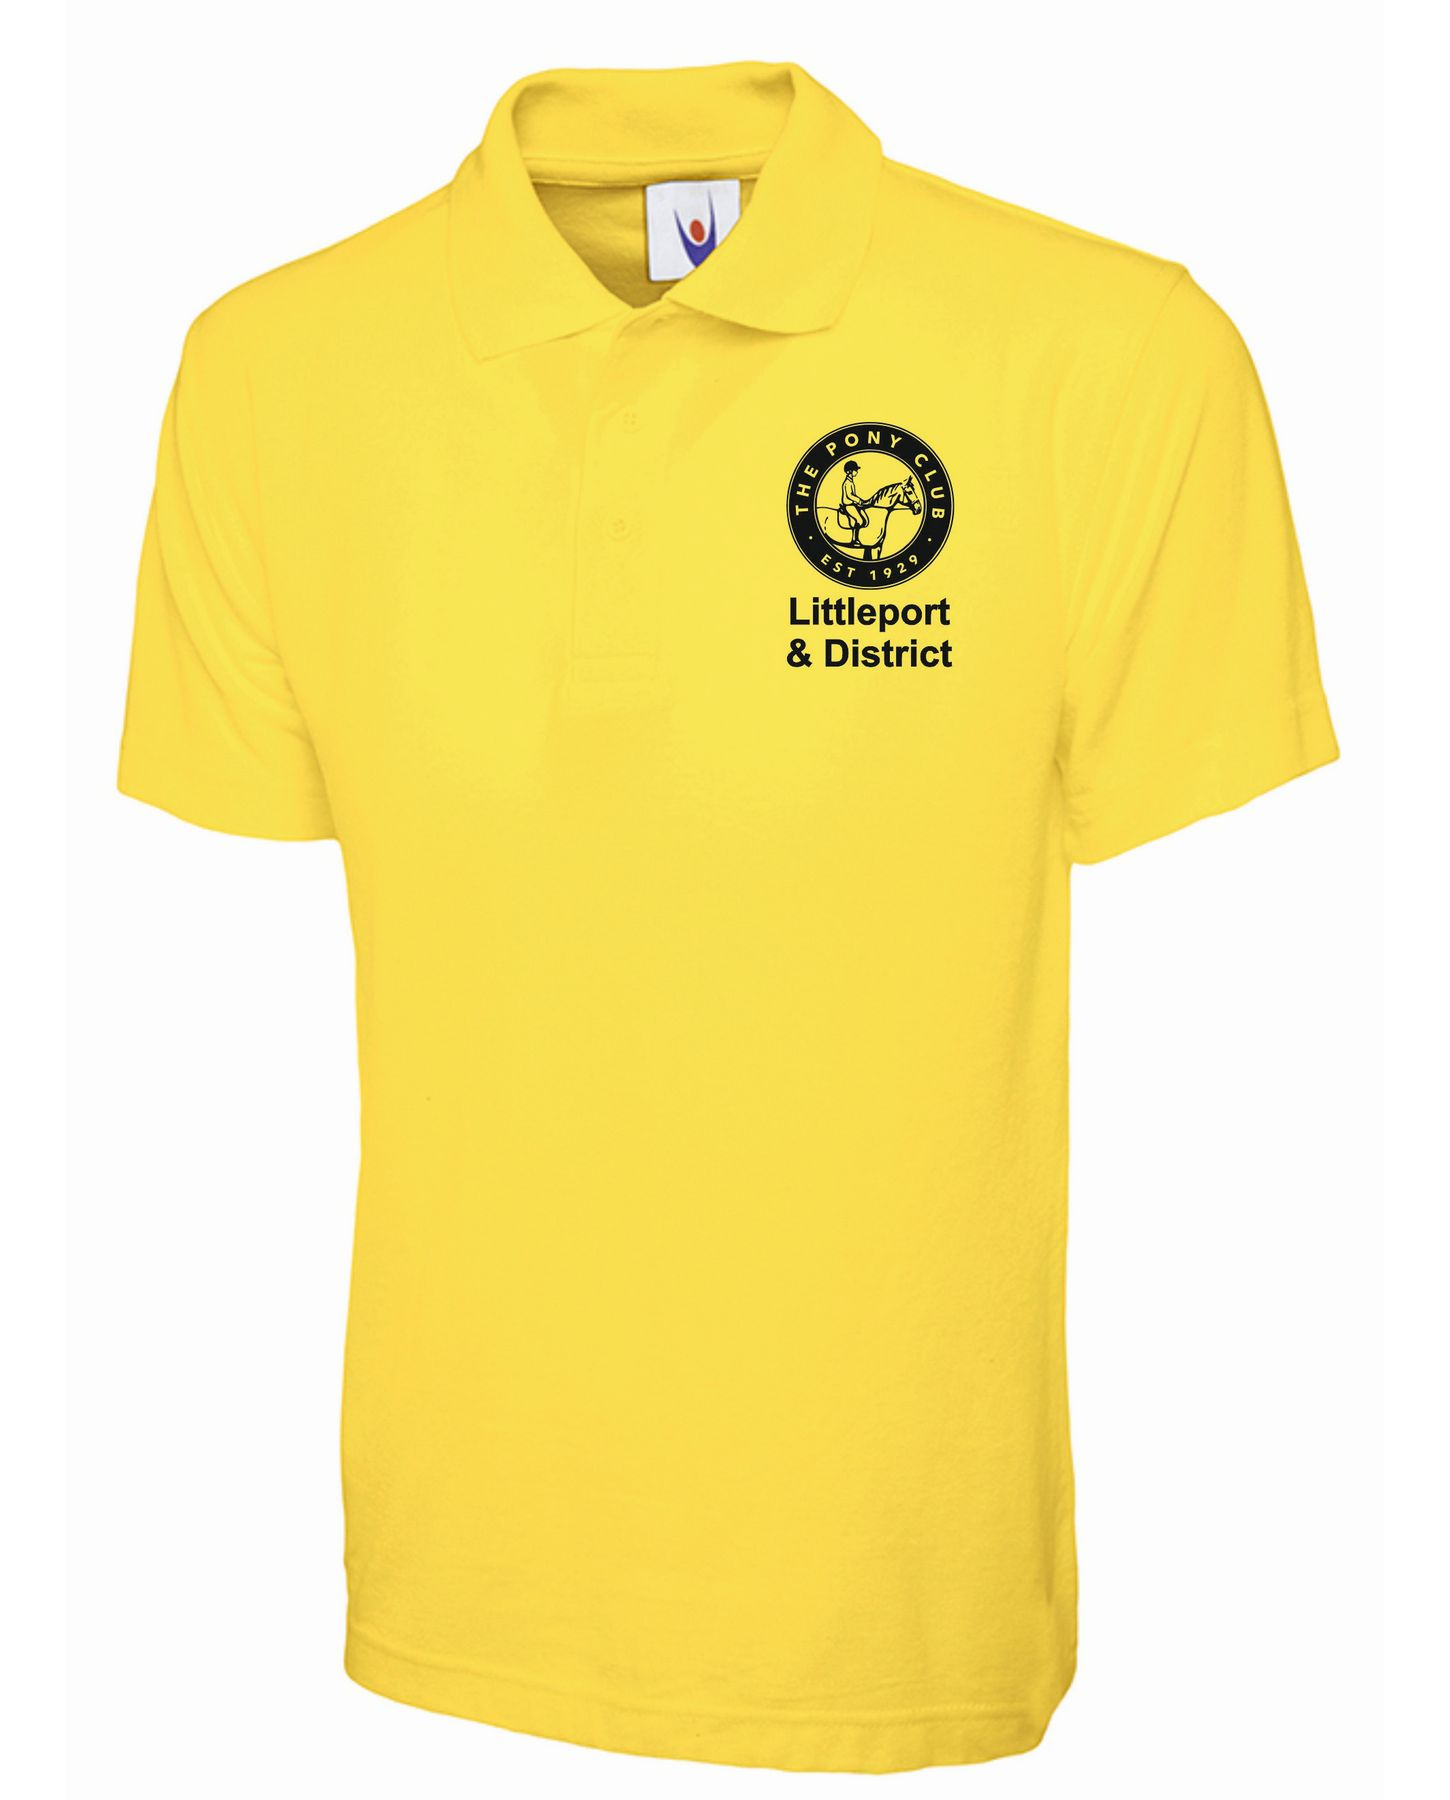 Littleport & District Pony Club – Polo Shirt Unisex